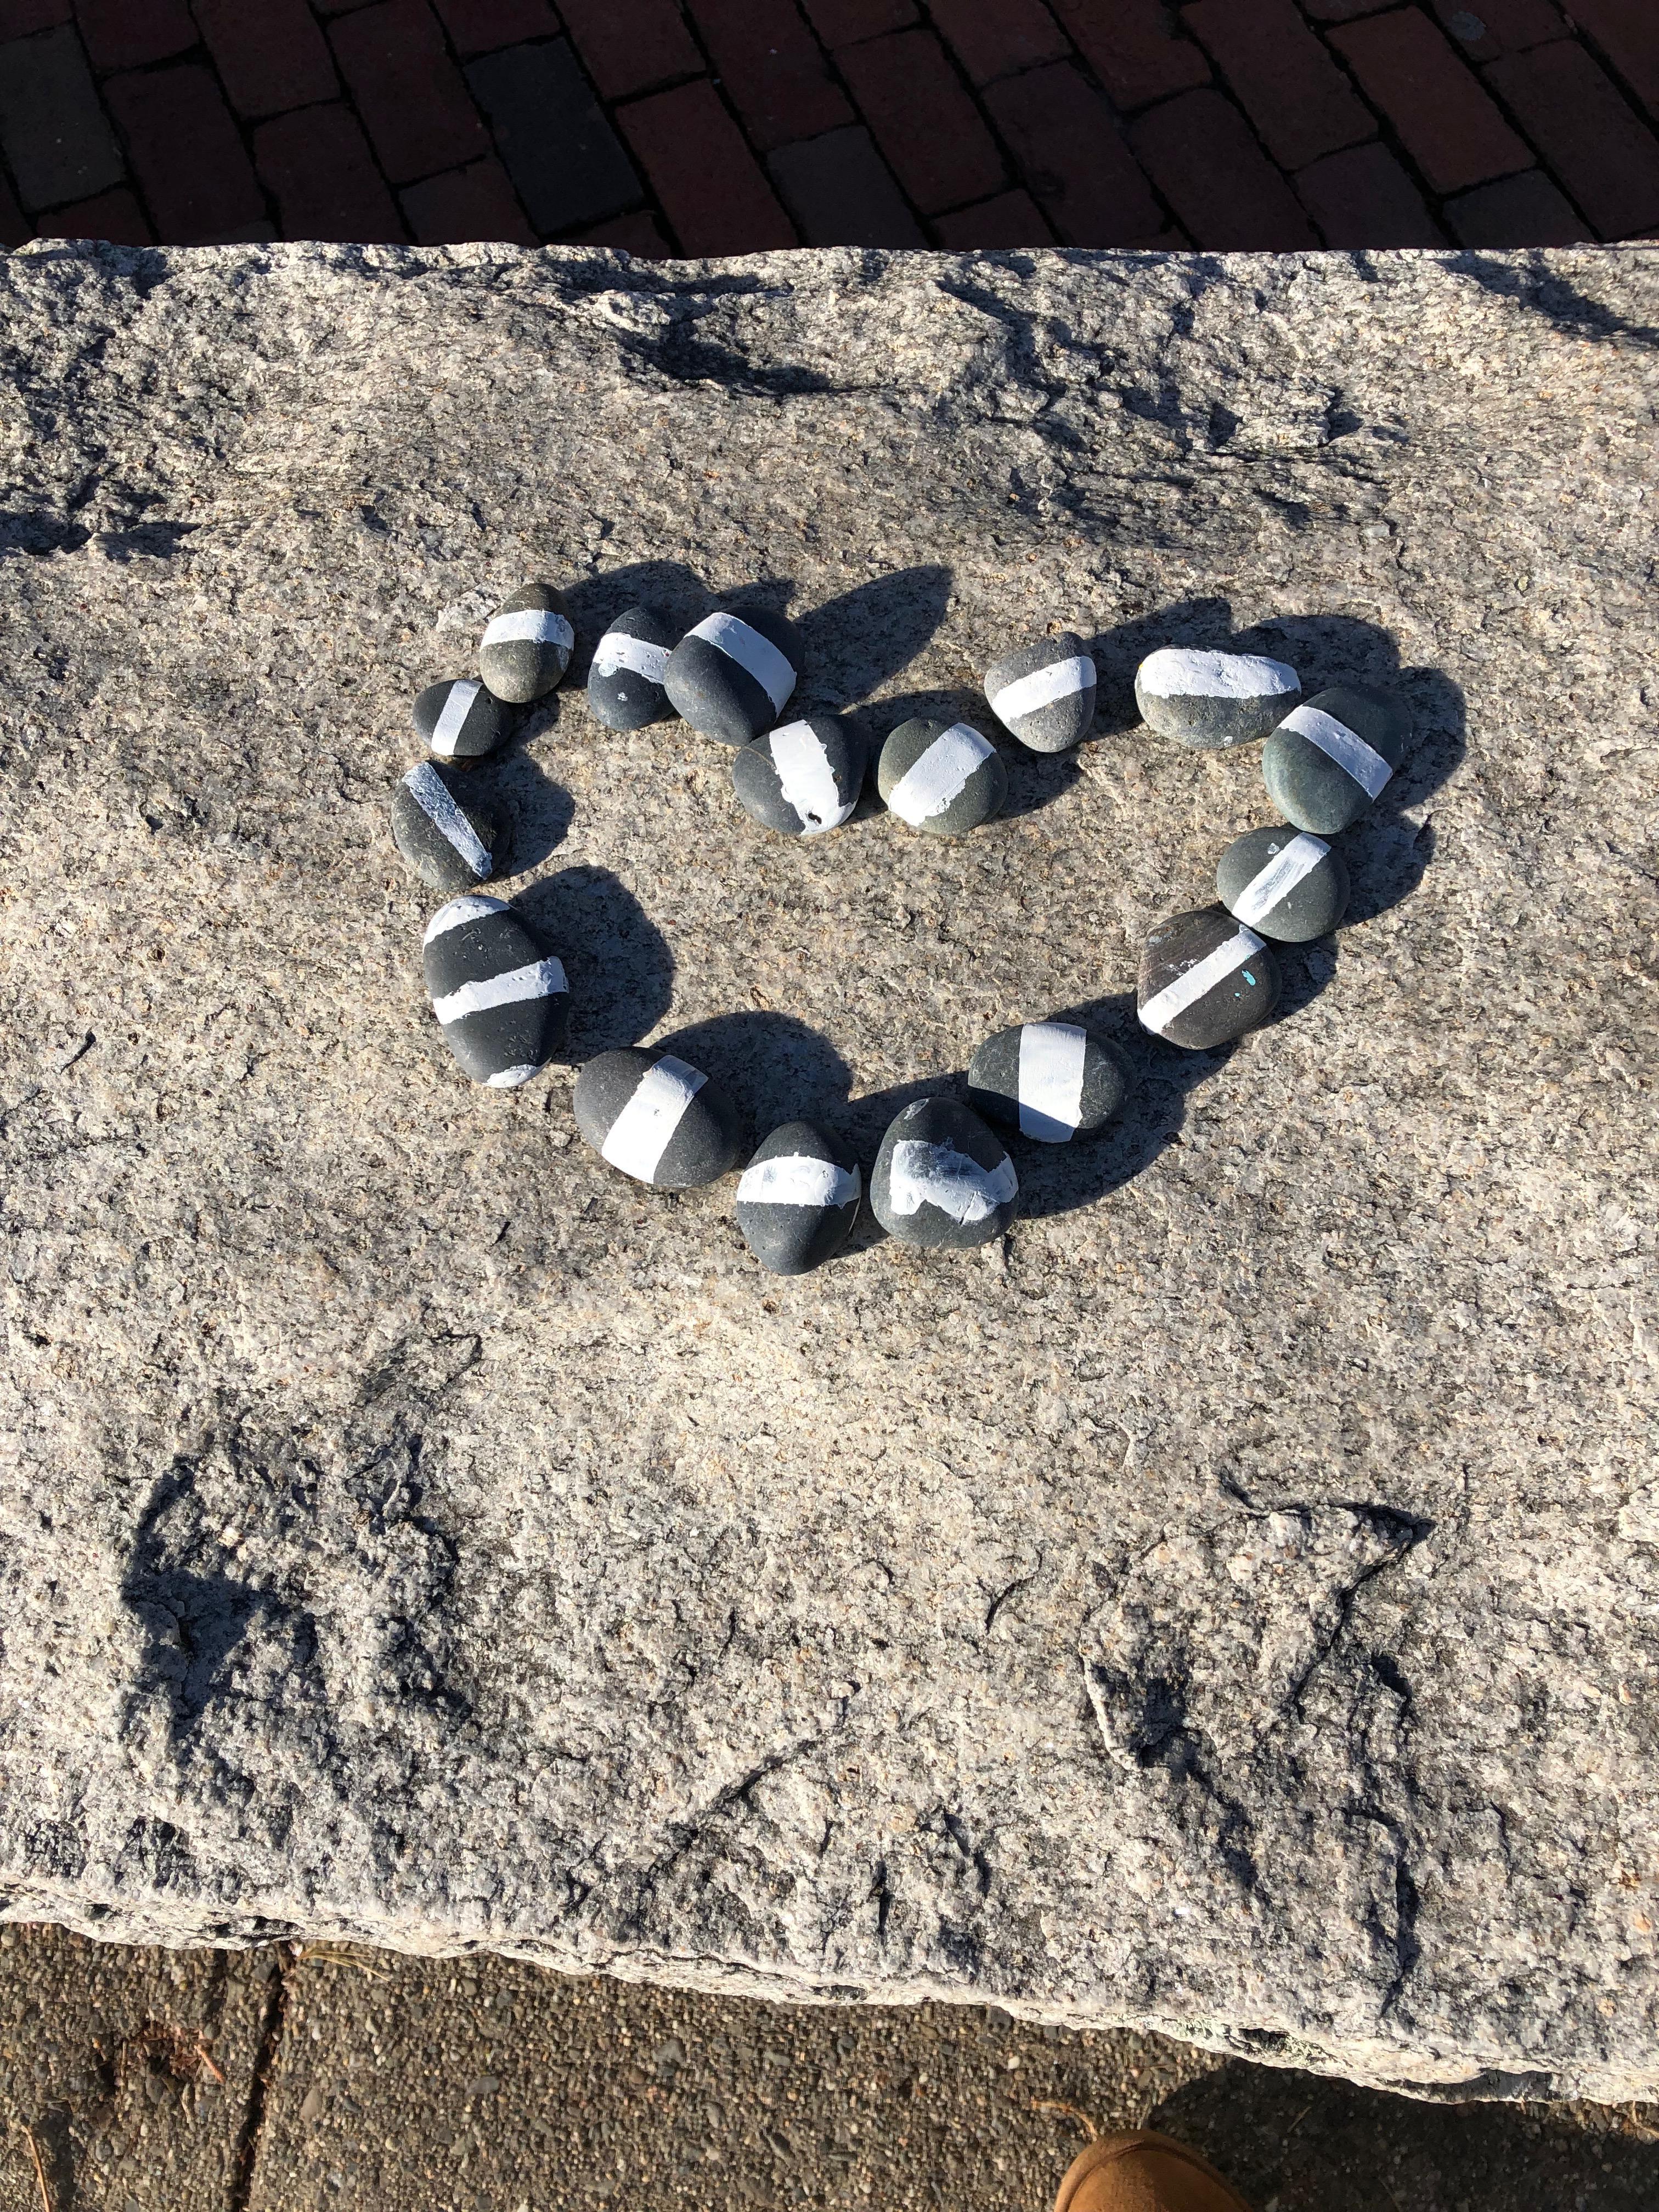 122218-lucky-stones-in-sunlight